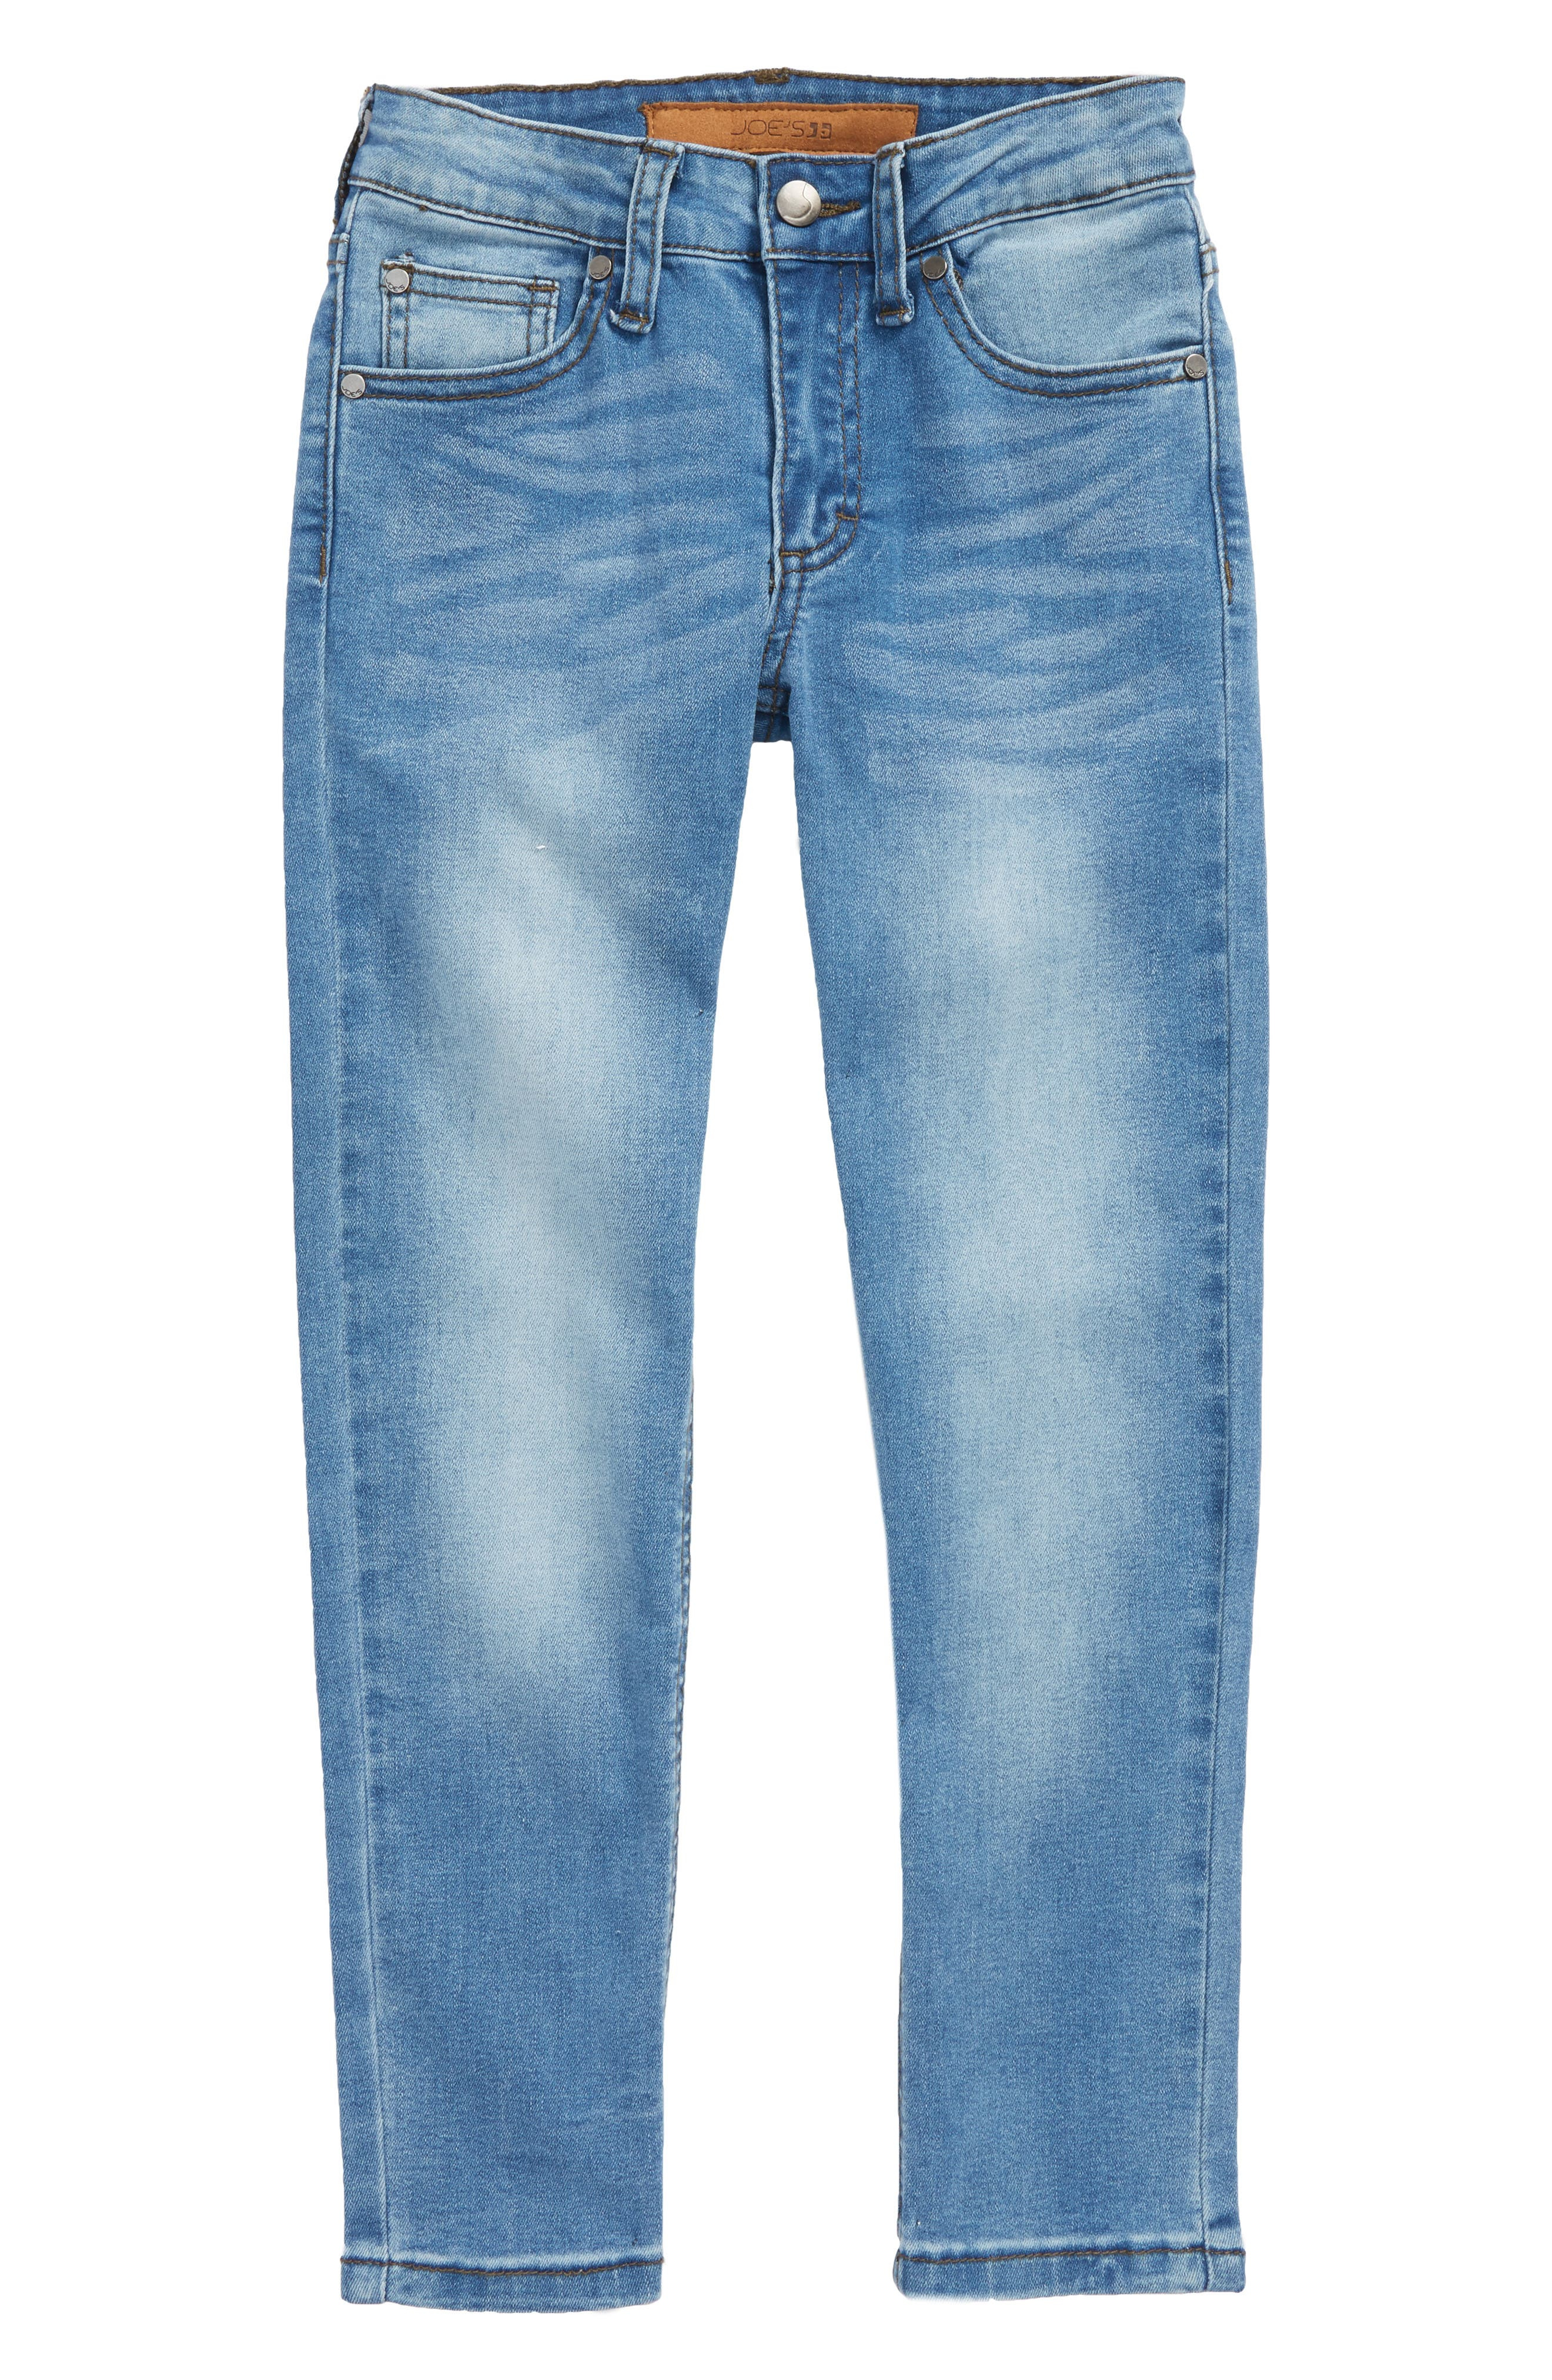 Rad Slim Fit Stretch Jeans,                             Main thumbnail 1, color,                             463